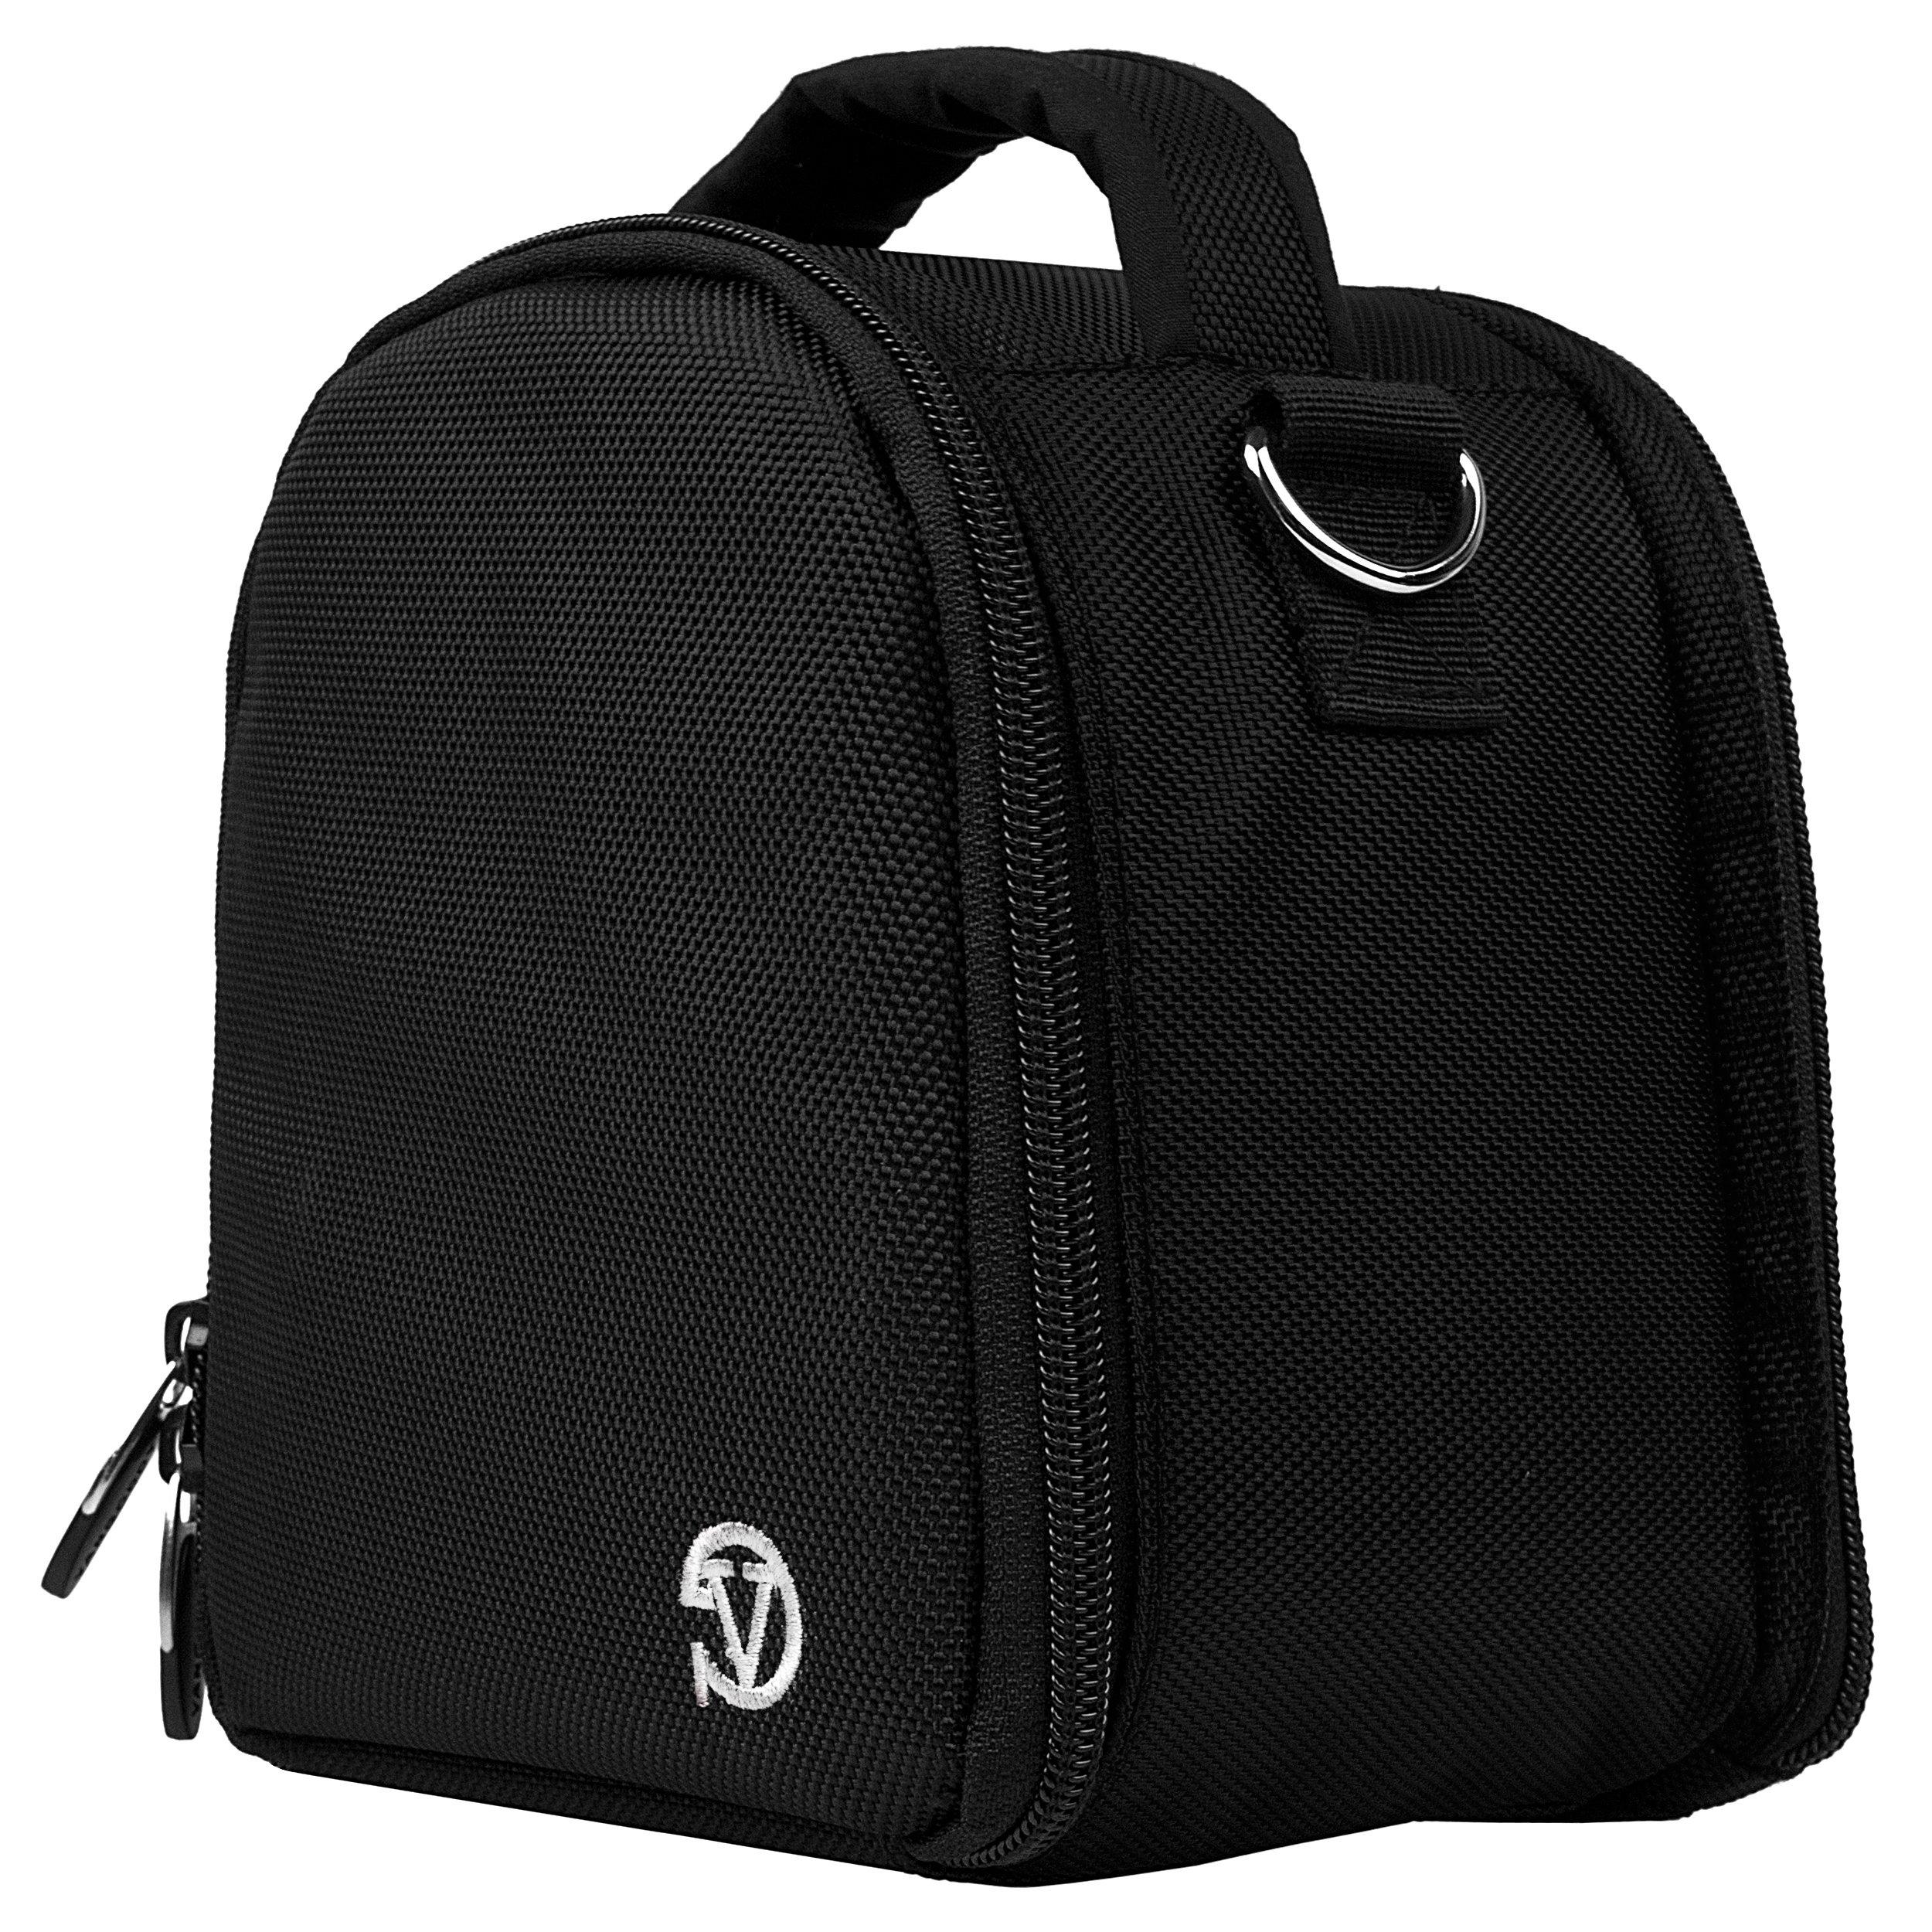 VanGoddy Laurel Carrying Handbag for Fujifilm FinePix S9800 Digital Camera by Vangoddy (Image #2)